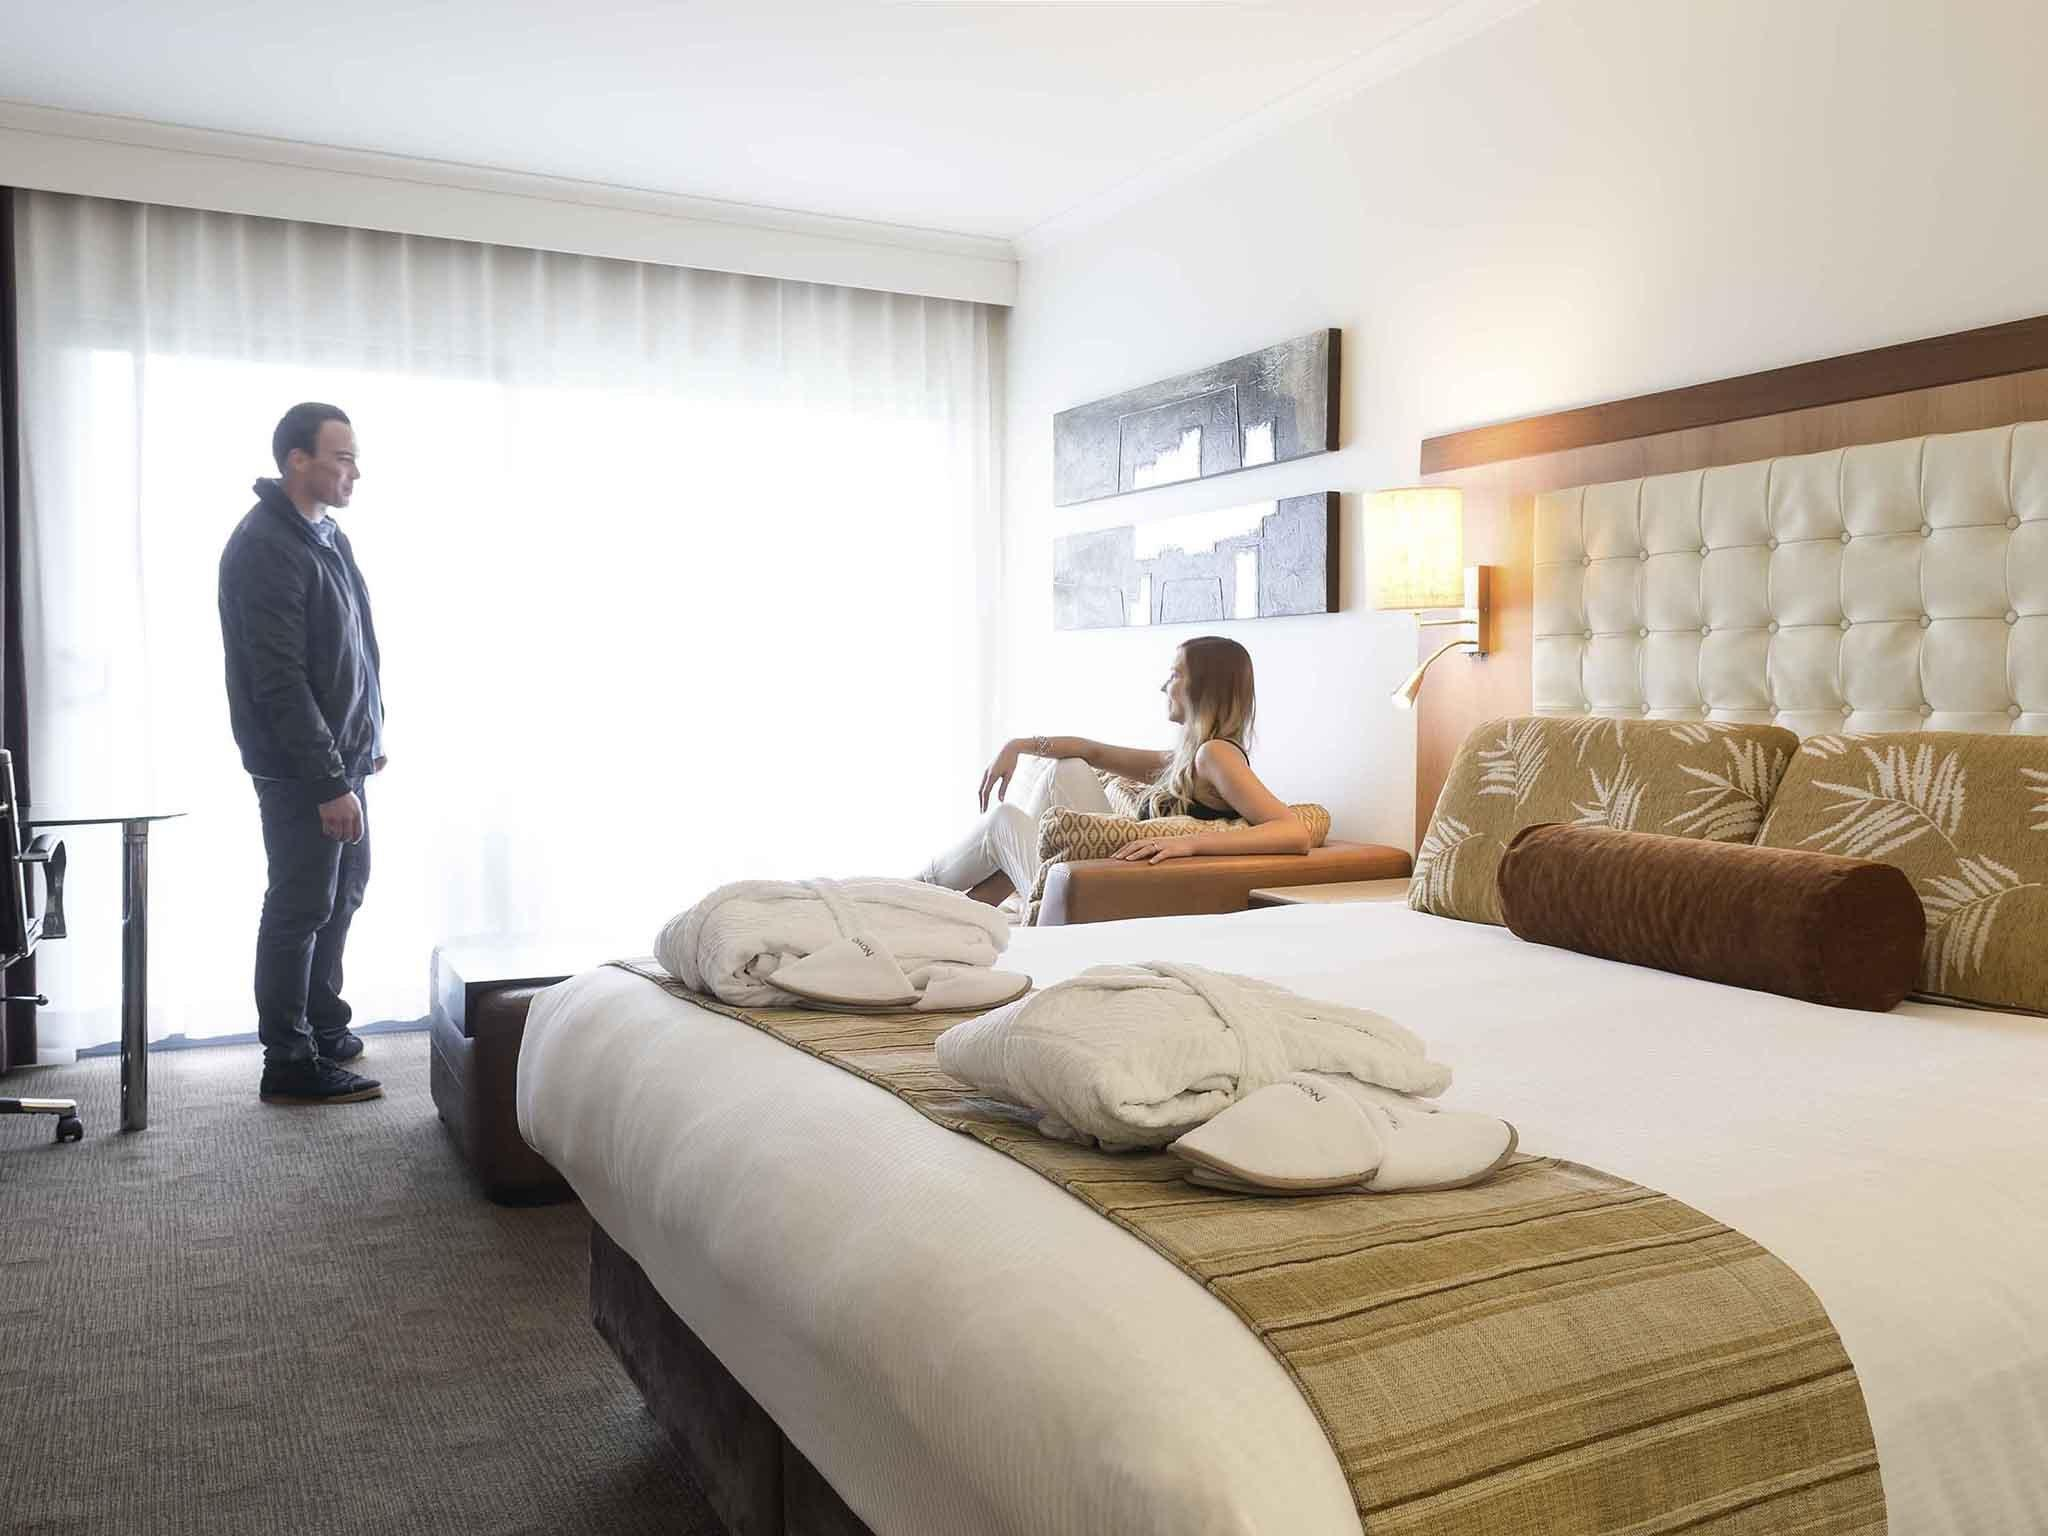 Book Novotel Barossa Valley Hotel Australia 2019 Prices From A